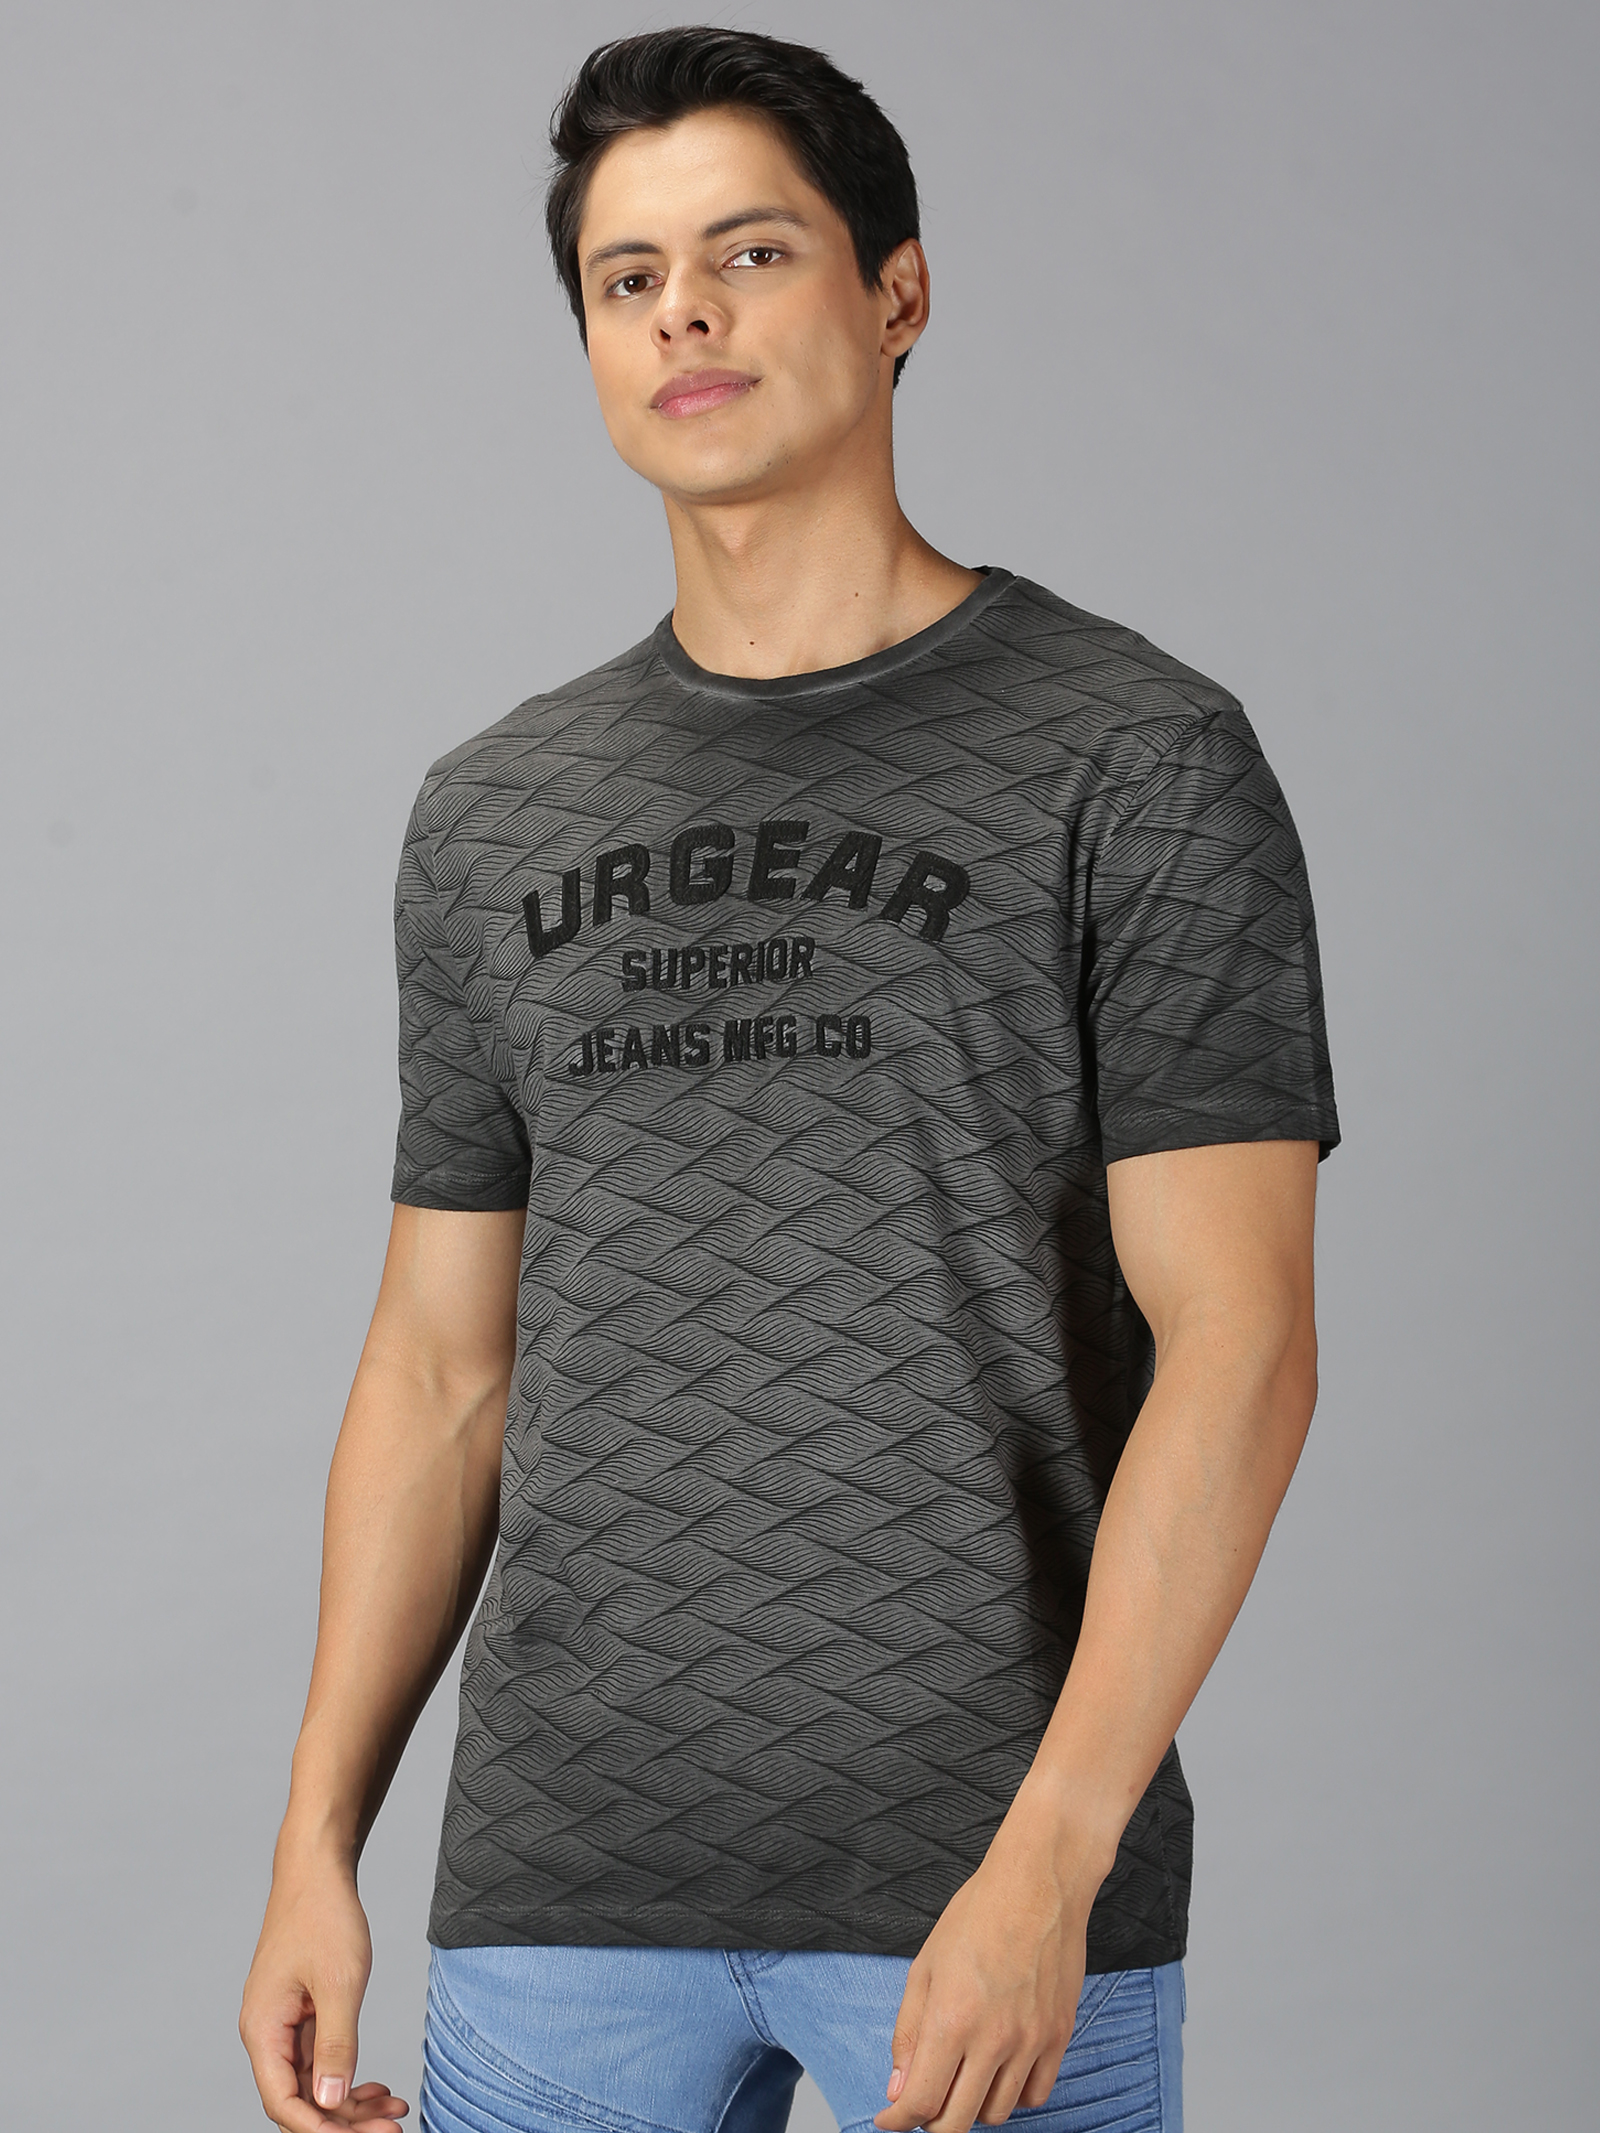 UrGear | UrGear Printed Men Round Neck Black T-shirt